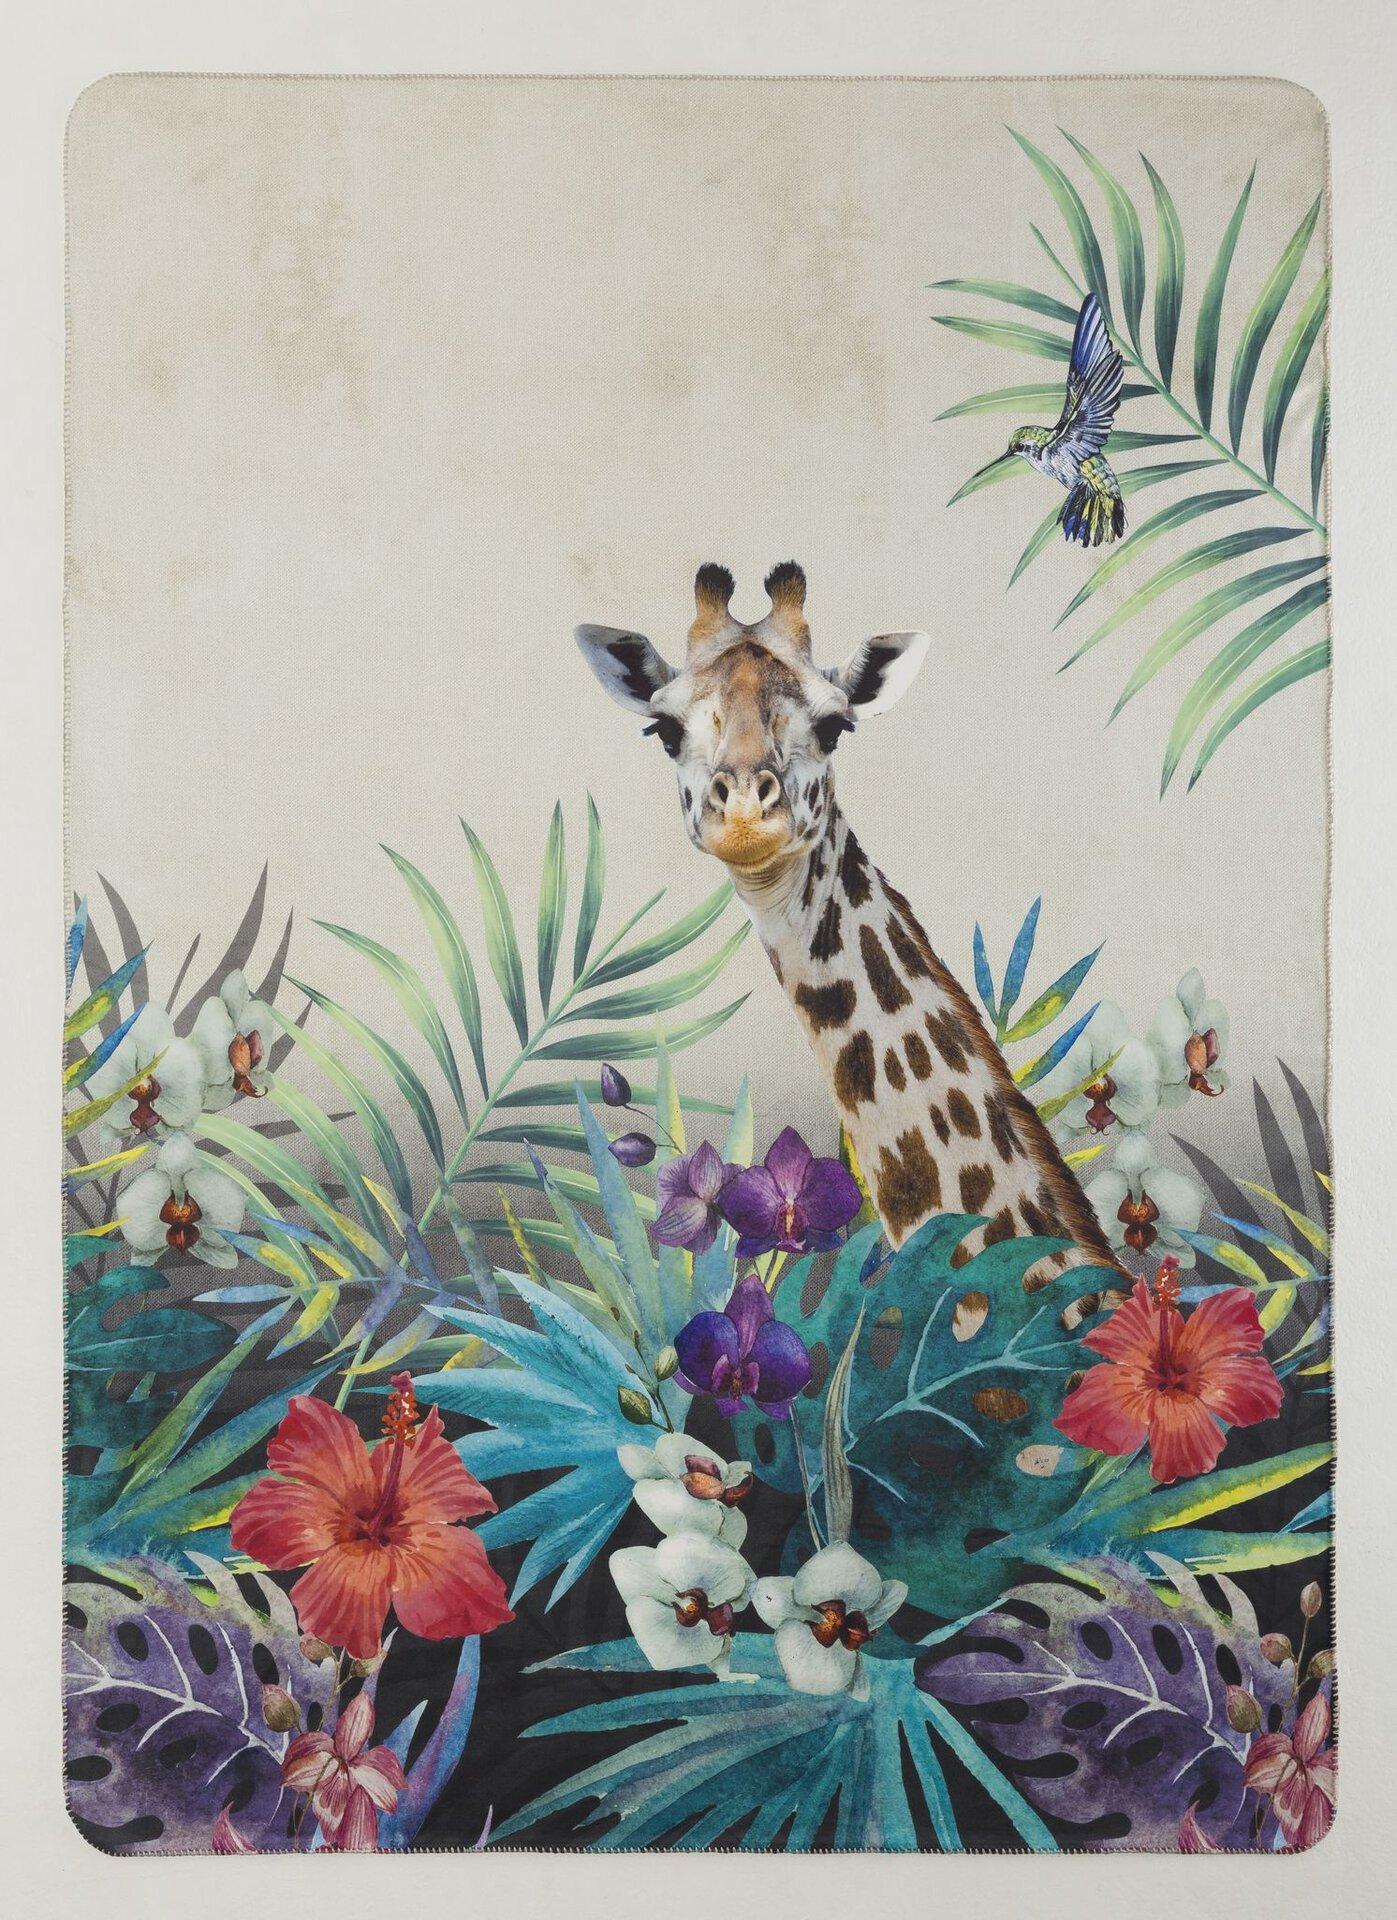 Wendedecke Safari Giraffe Casa Nova Textil mehrfarbig 150 x 200 cm